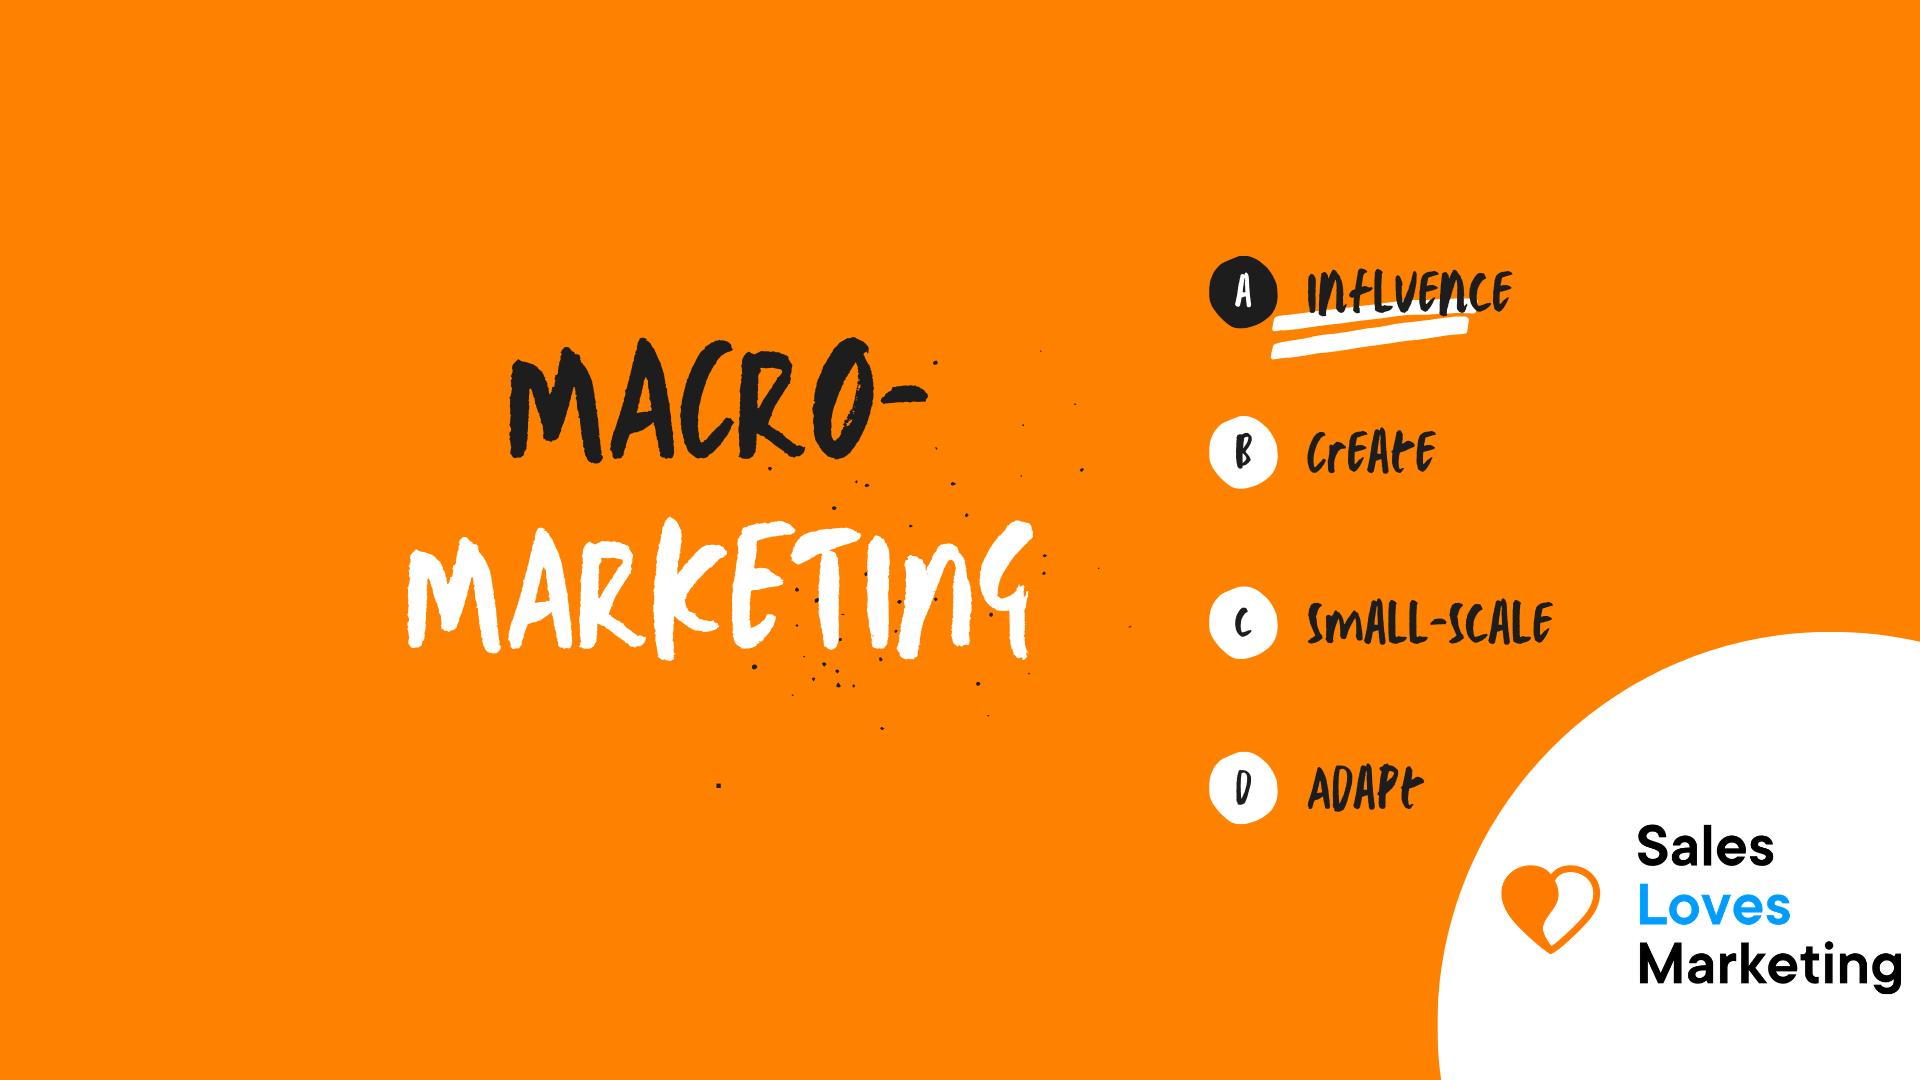 Macro Marketing